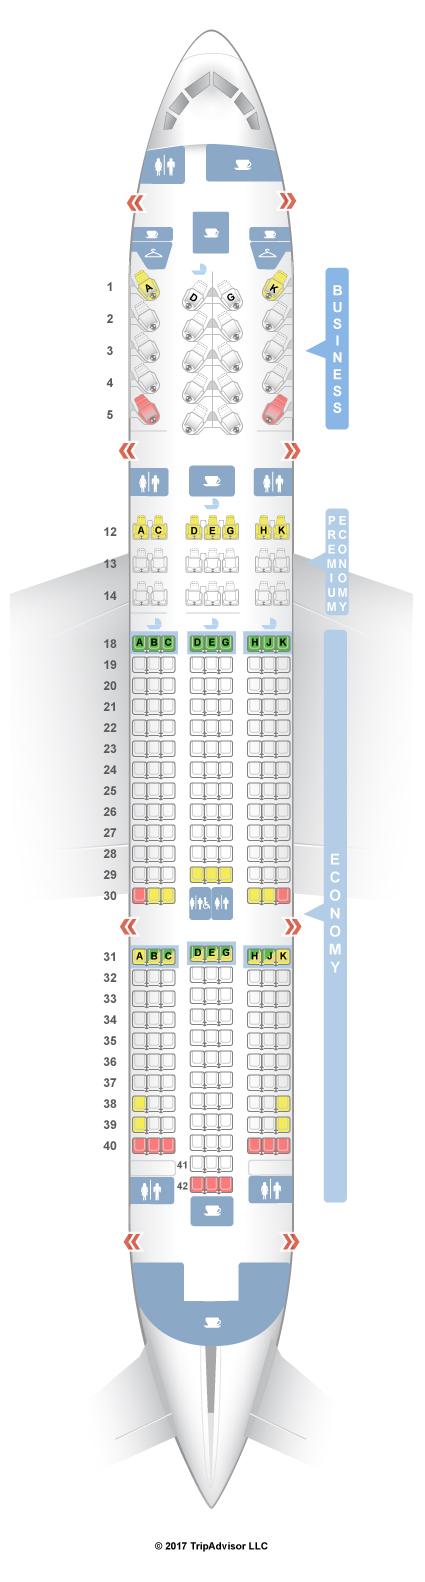 Seatguru Seat Map Air Canada Boeing 787 8 788